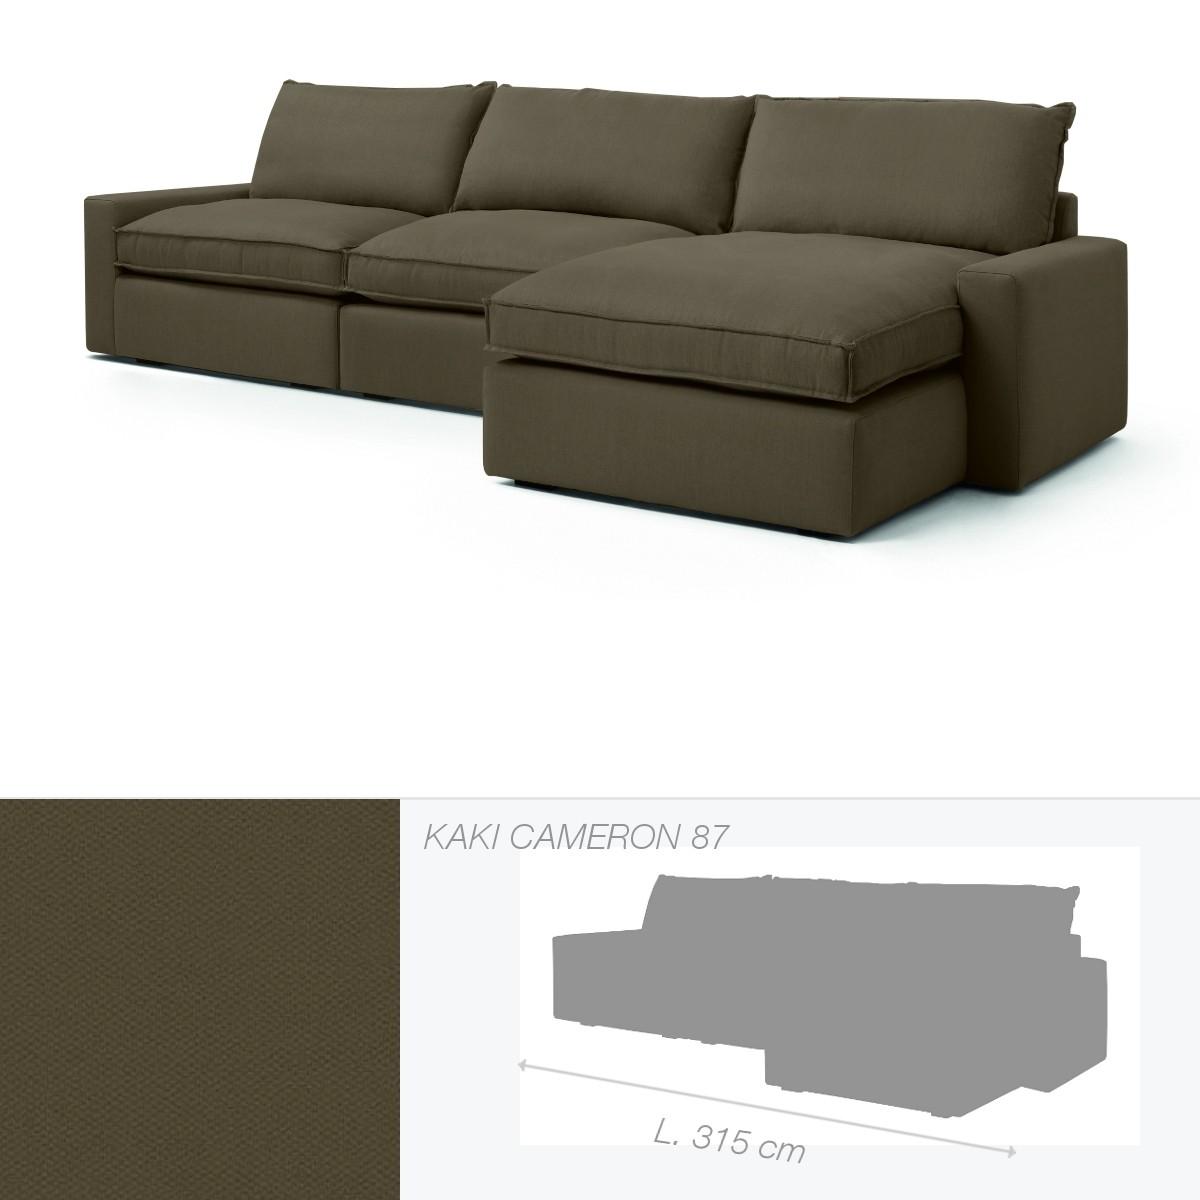 canap dakota de marie 39 s corner chauffeuse droite kaki cameron 87. Black Bedroom Furniture Sets. Home Design Ideas